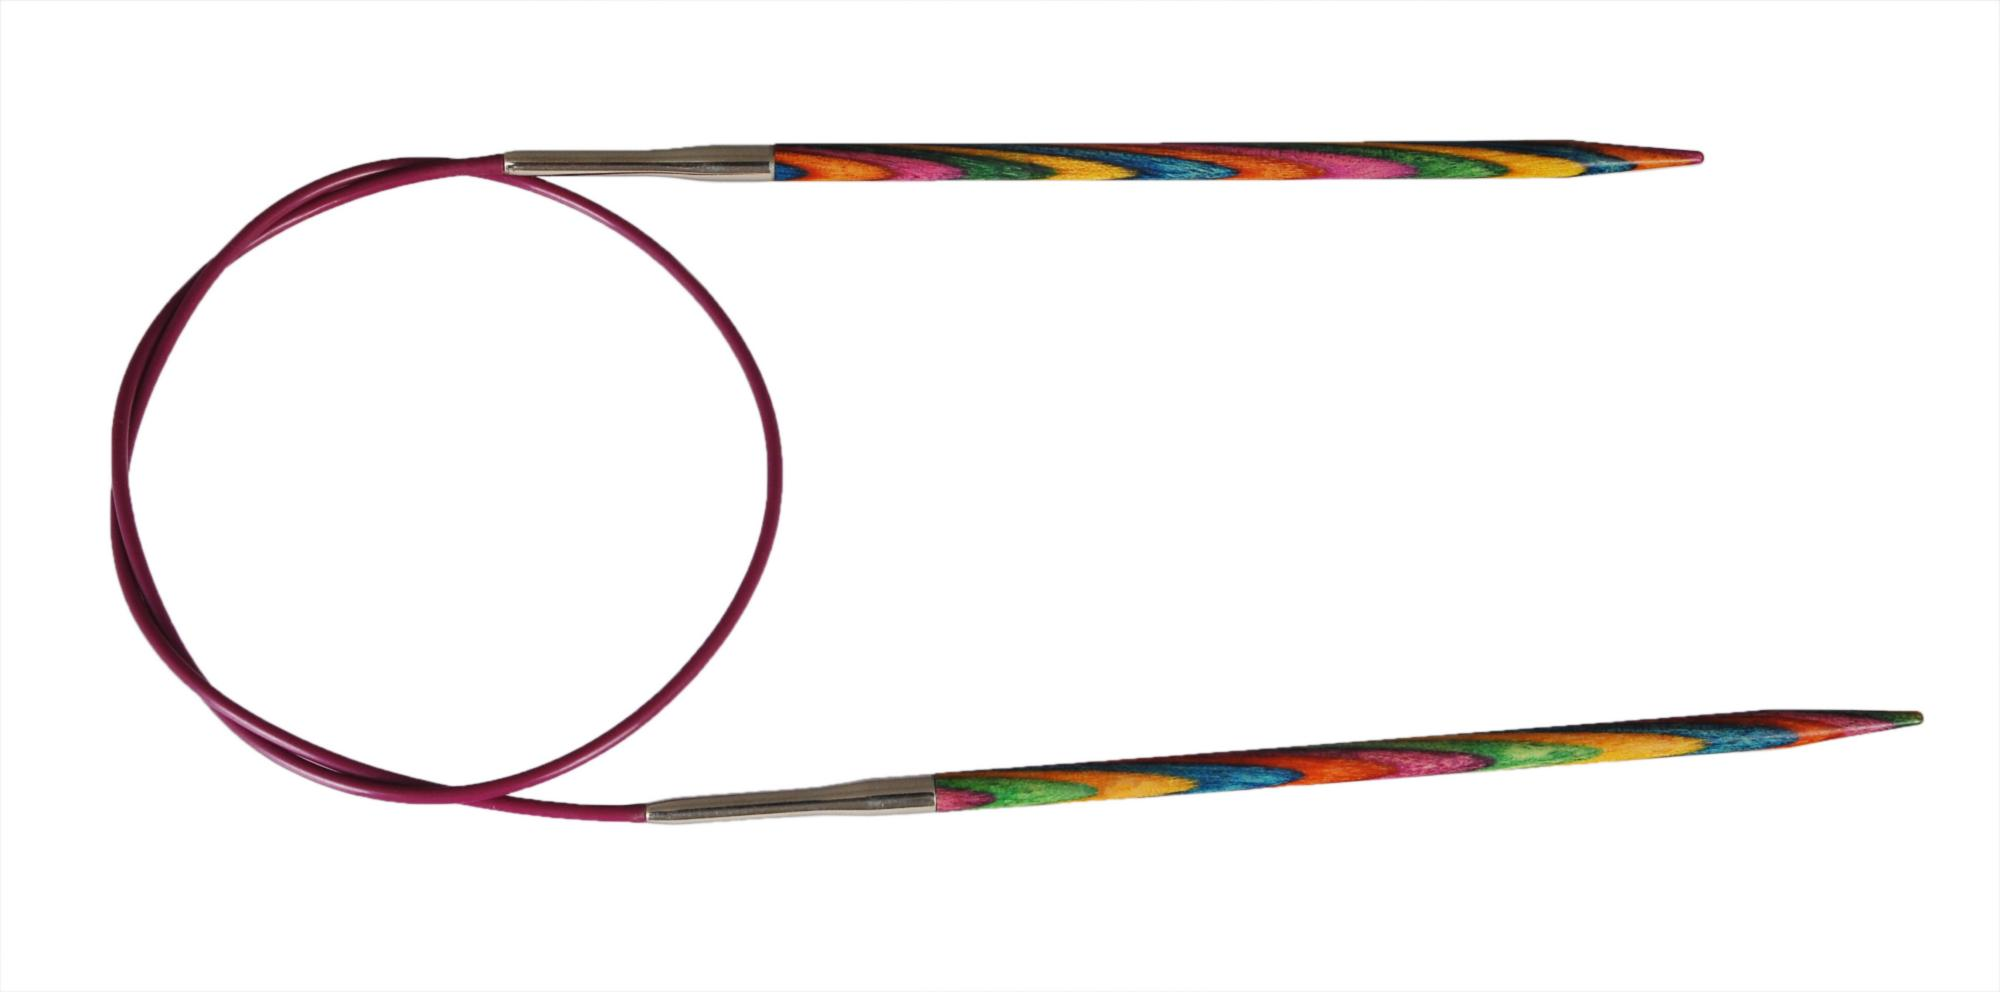 Спицы круговые 50 см Symfonie Wood KnitPro, 20392, 5.00 мм